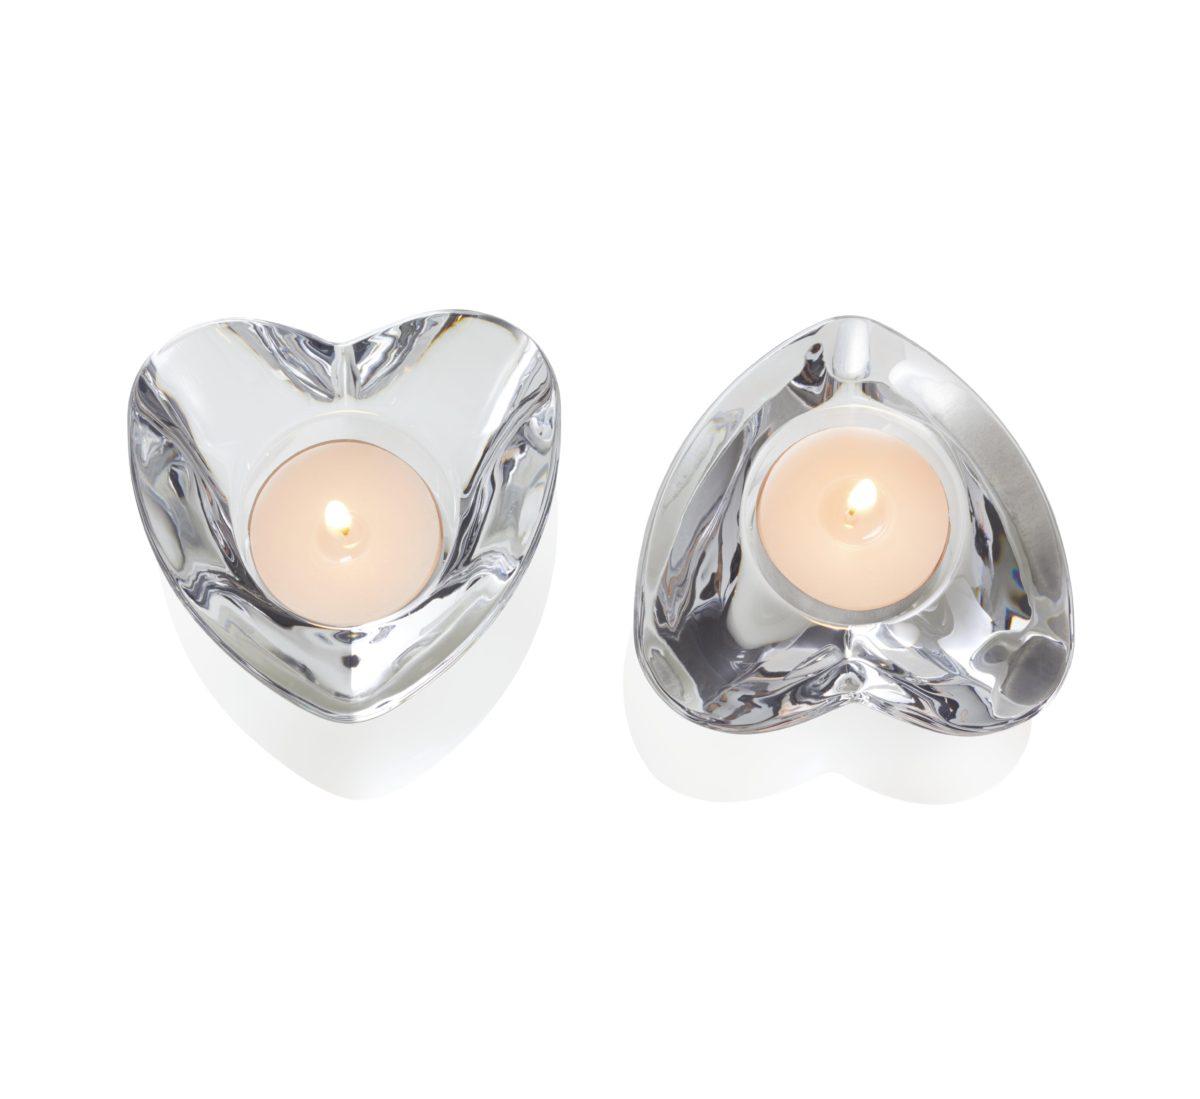 teelichthalter set transparent trend glas leonardo 1200x1099 - Suport pentru lumânare heart Limito (L026003)